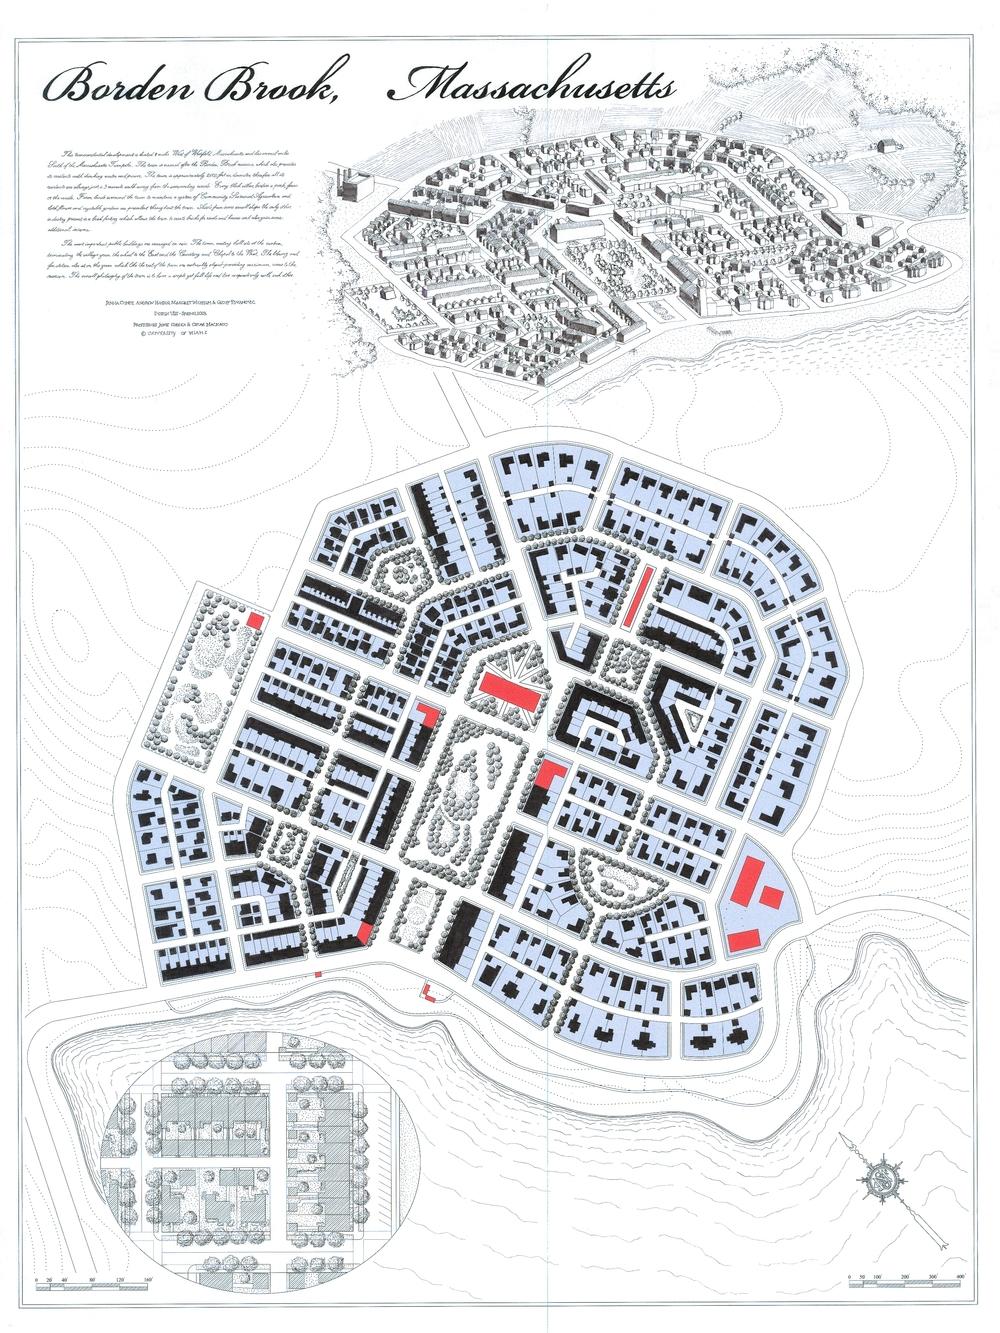 Self-sustaining New Urbanism community